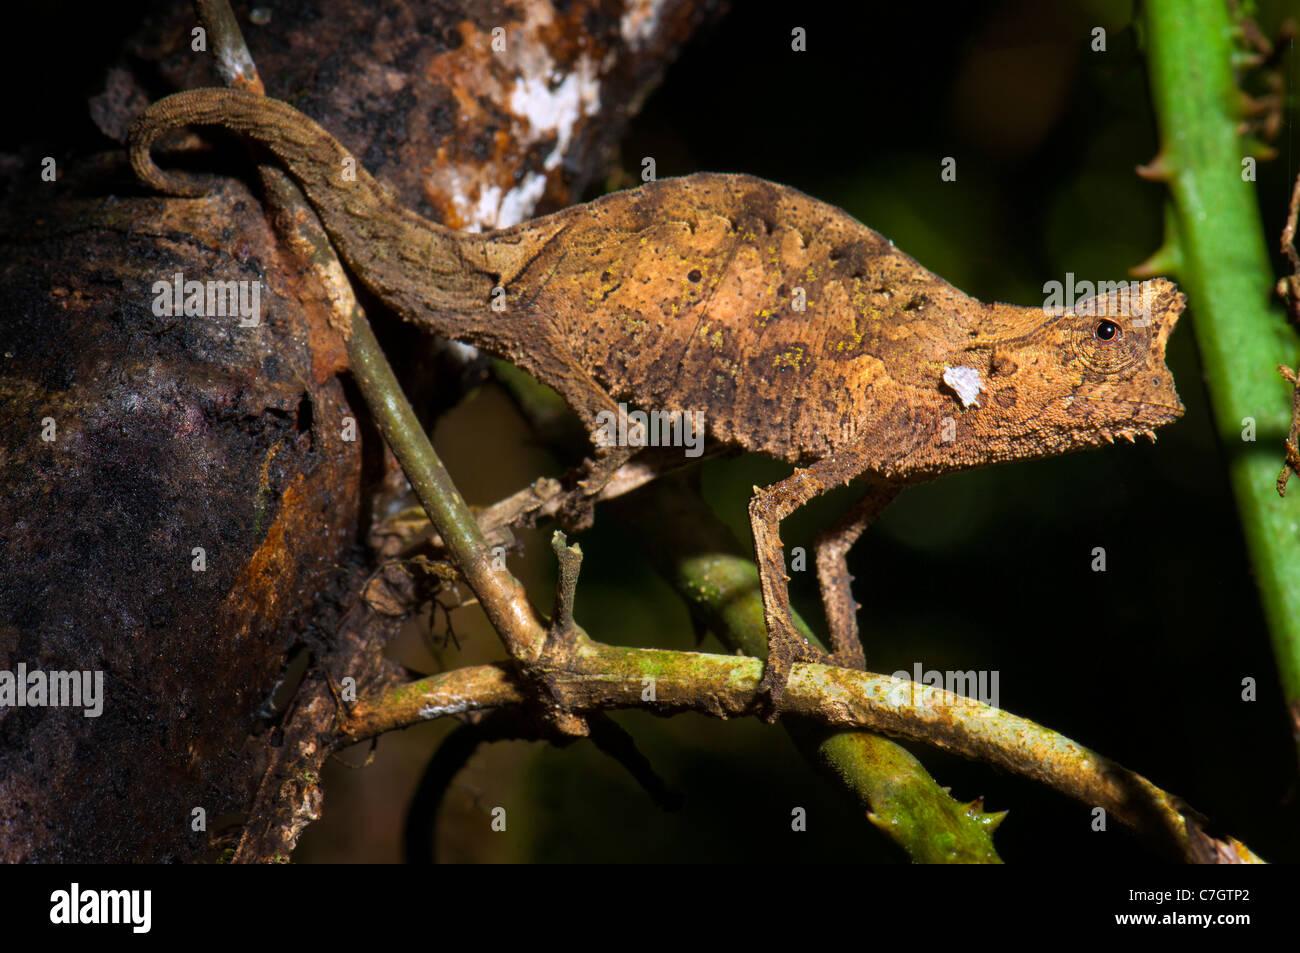 Mini smallest Chameleon Chamäleon BROOKESIA madagascar standing upright wild wildlife wilderness animal ground - Stock Image